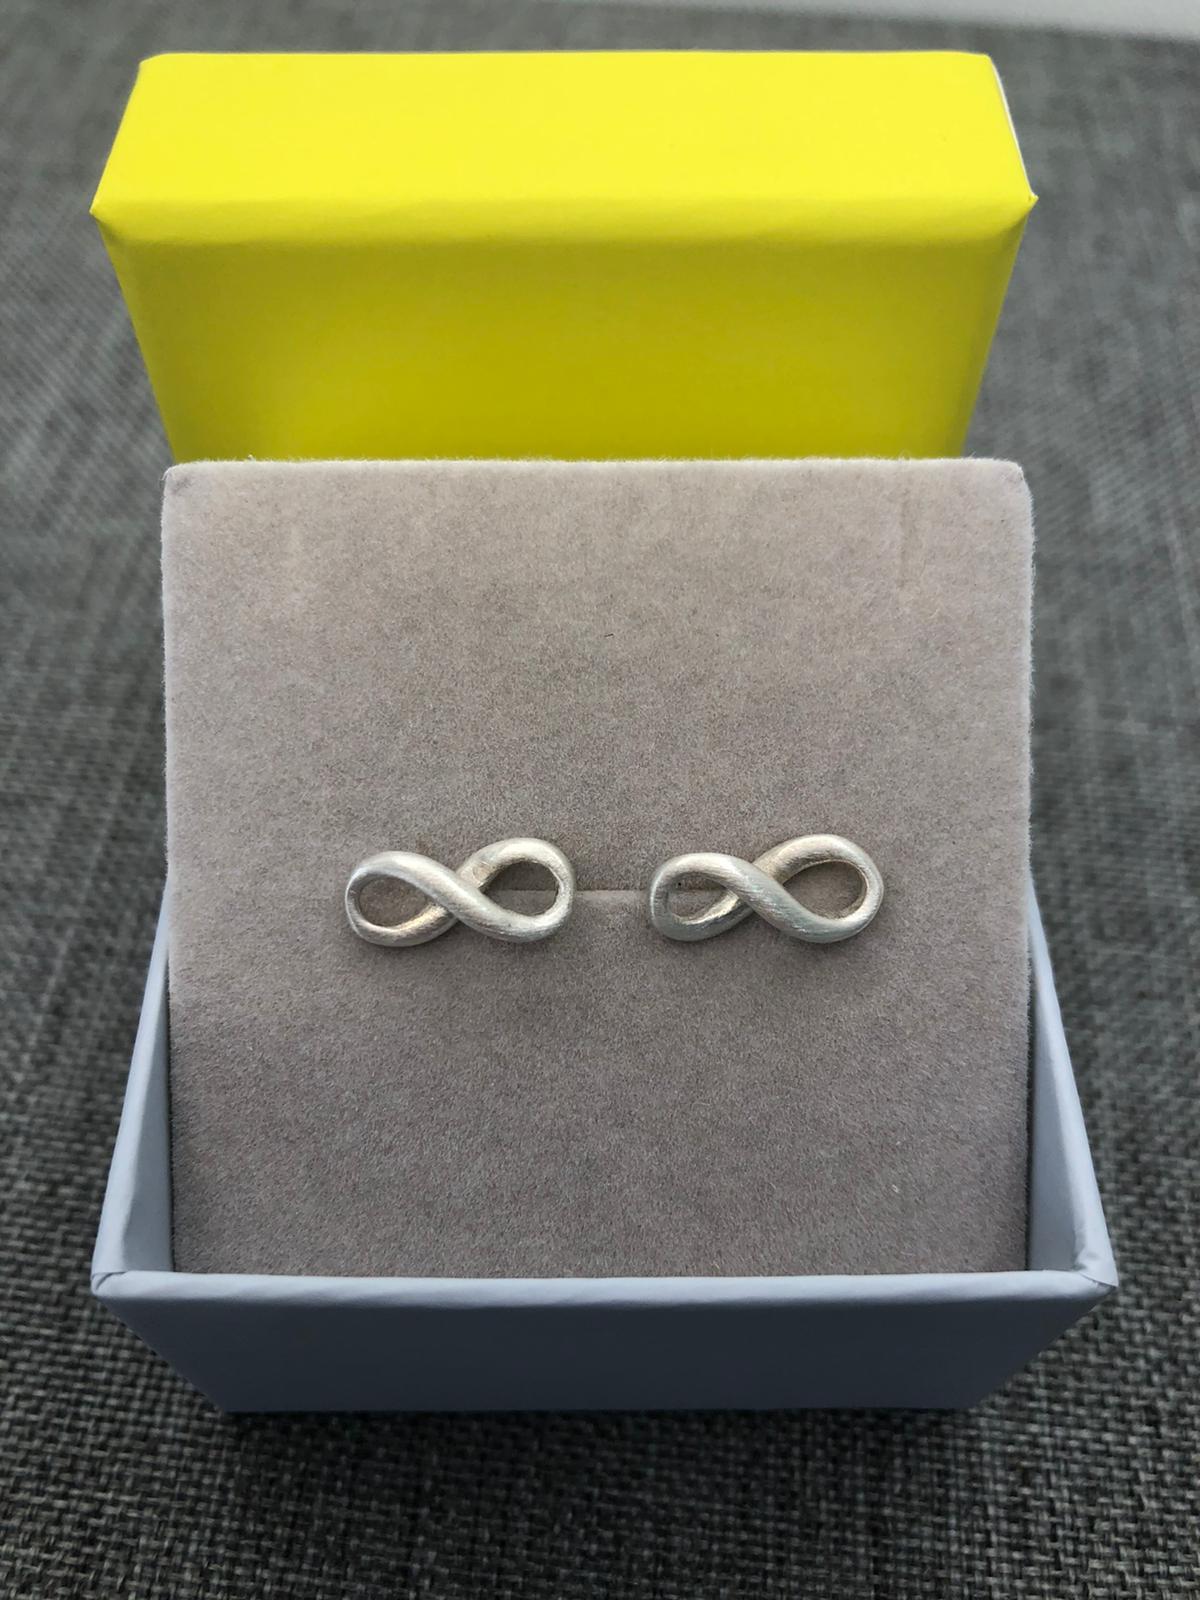 Infinity Stud Earrings, Sterling Silver (Matt Finish) by Chris Lewis